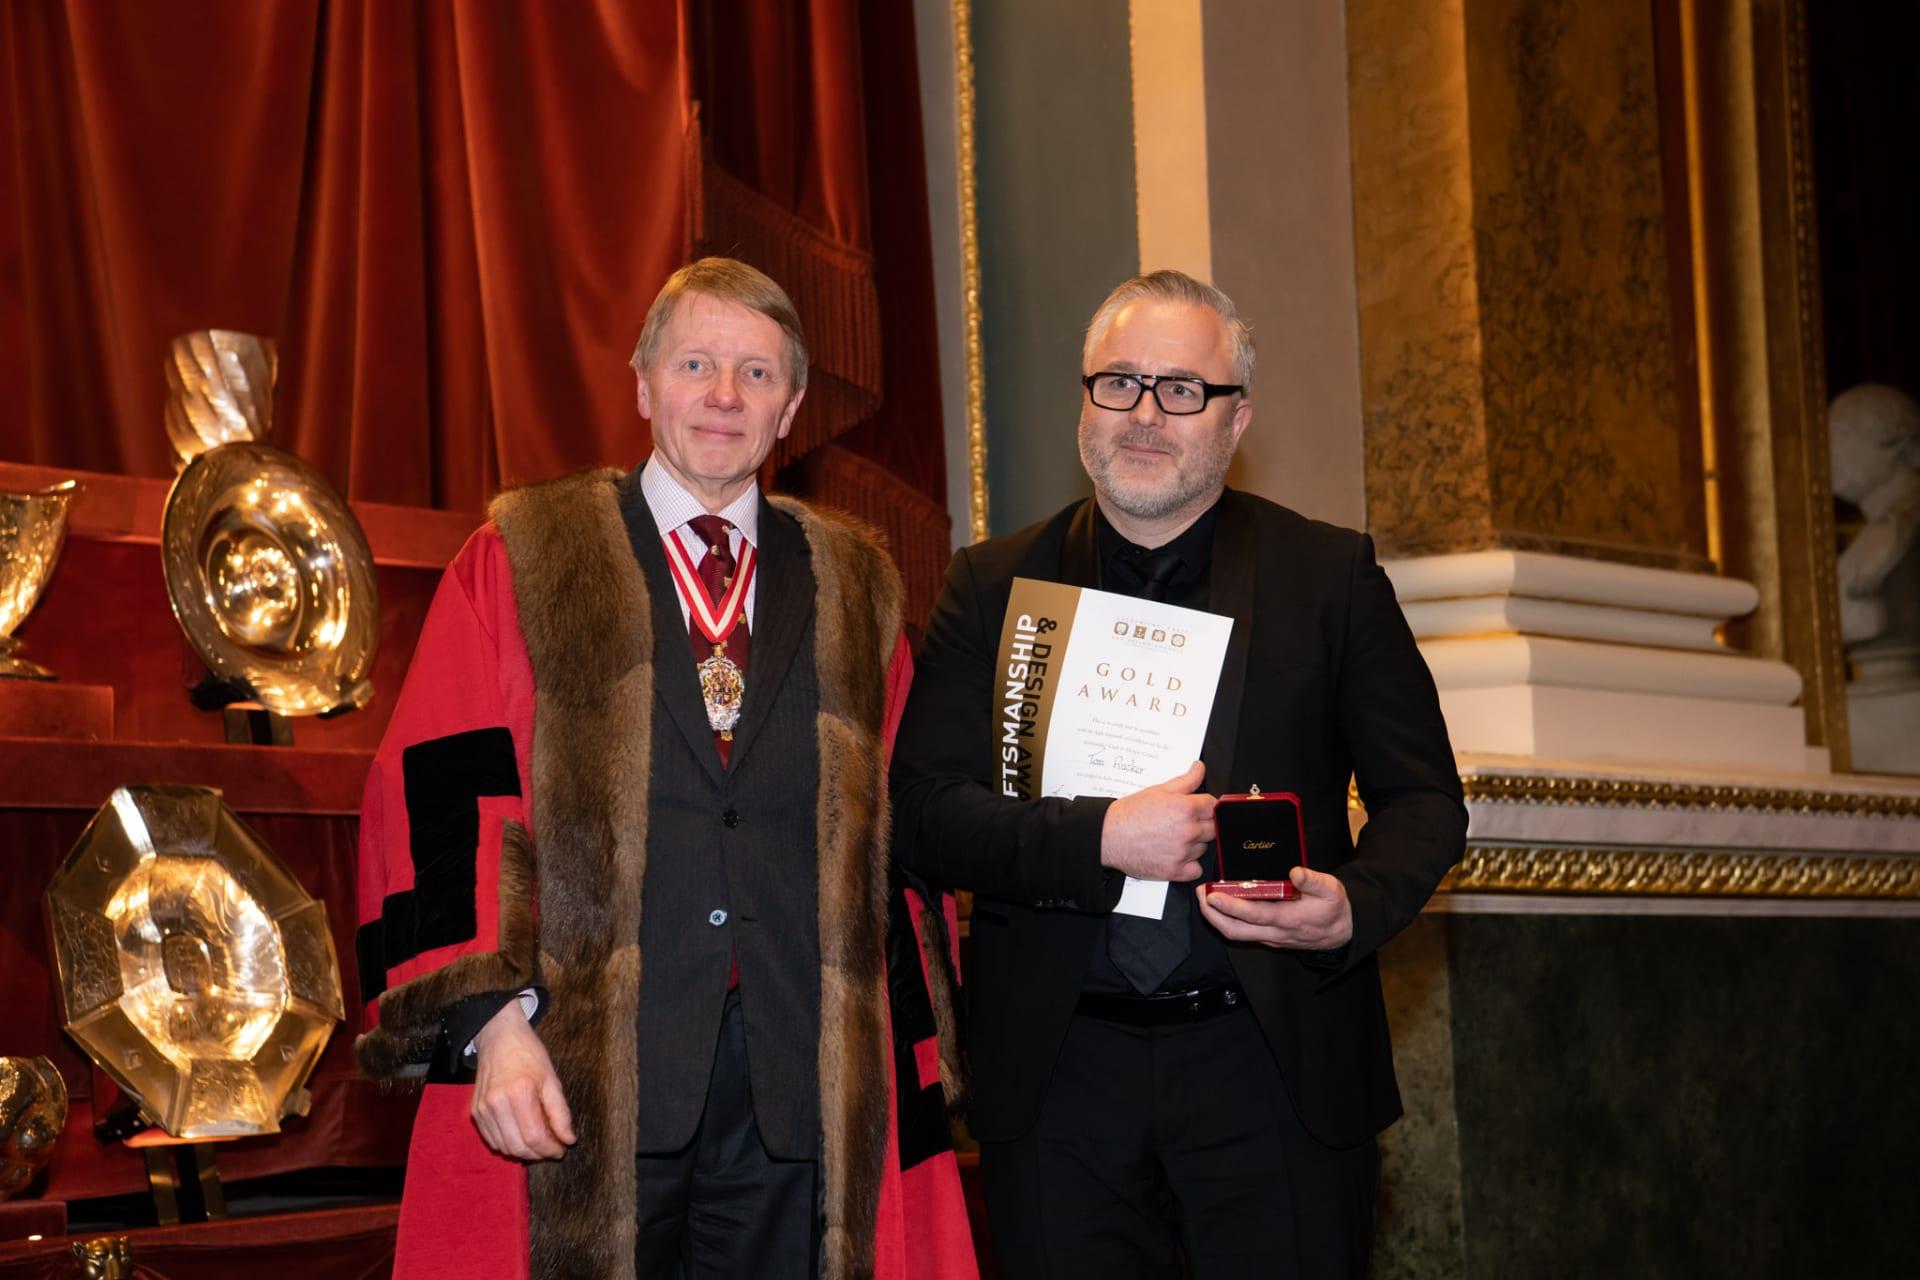 Tom Rucker receiving the Cartier Award from Prime Warden, Timothy Schreder